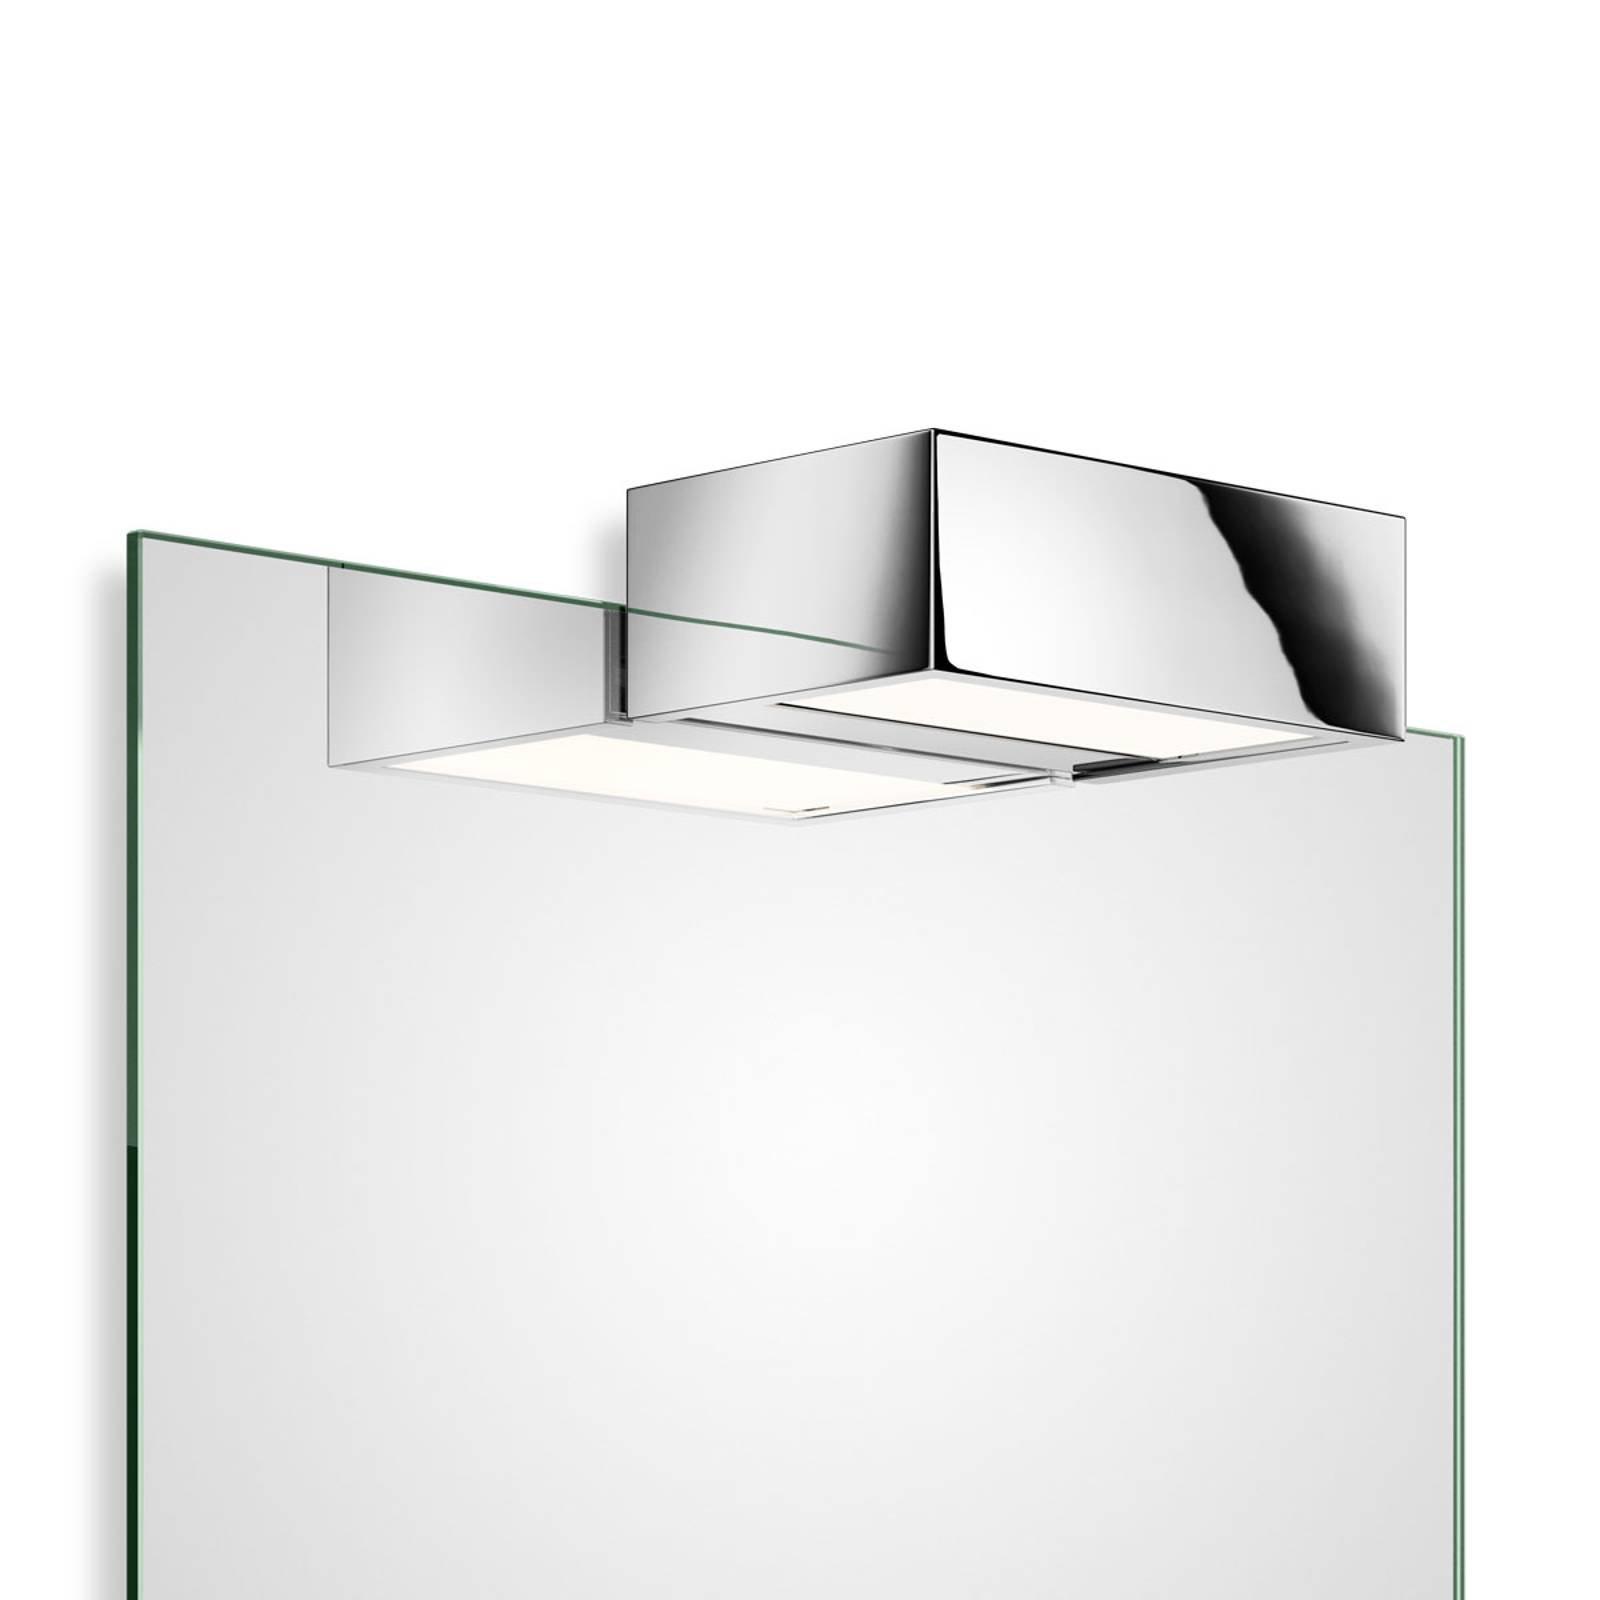 Decor Walther-boks 1-15 N LED-speillampe 3 000 K